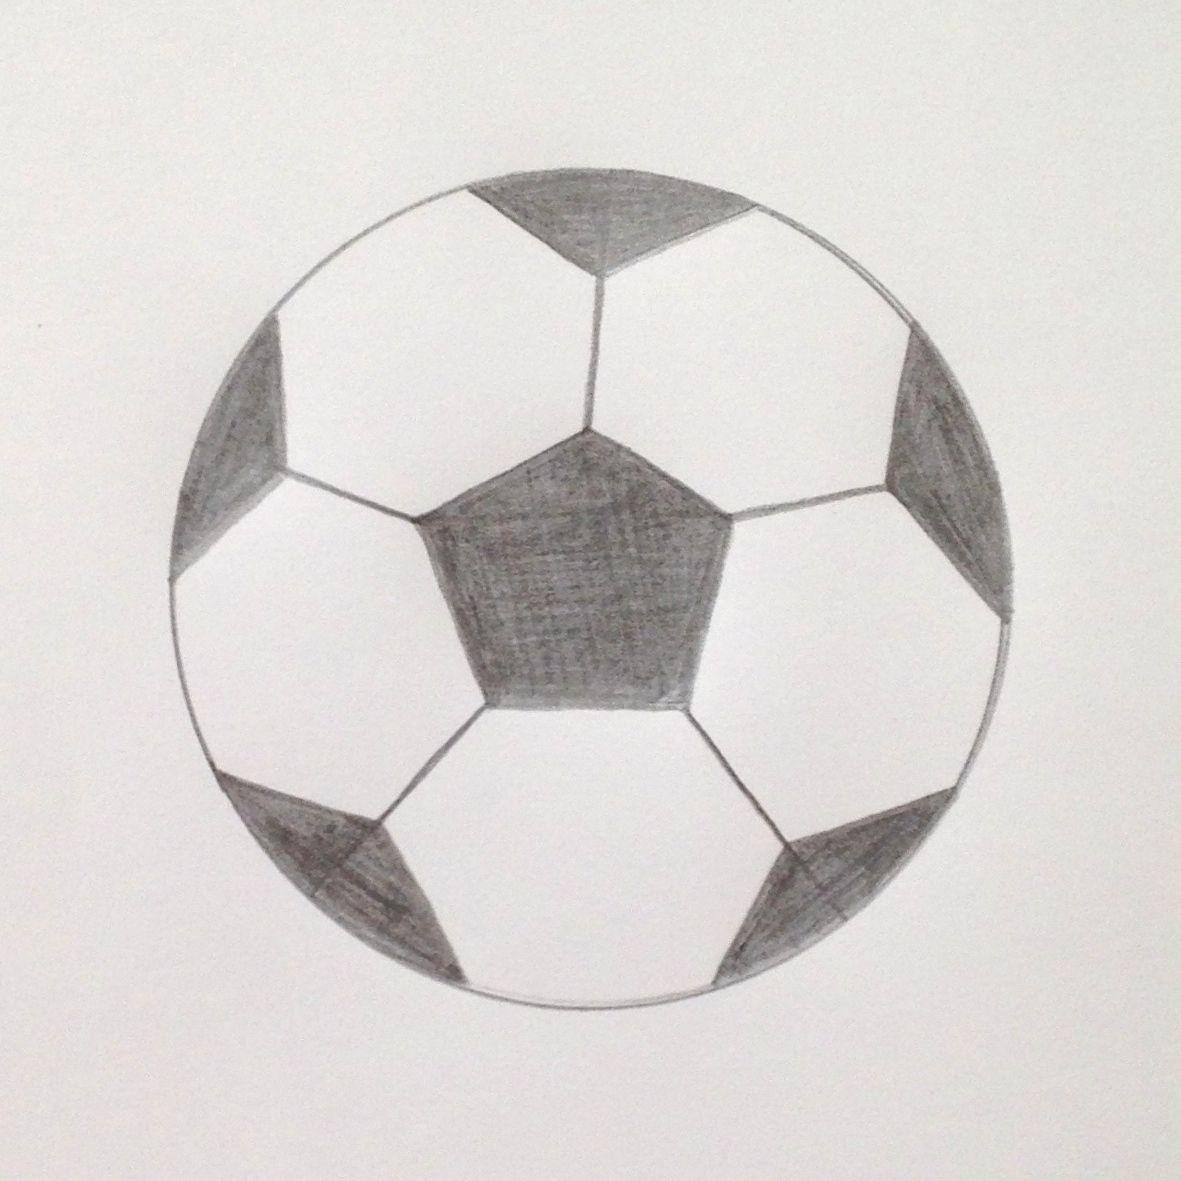 Art With Math Draw A Simple Soccer Ball Soccer Ball Ball Drawing Soccer